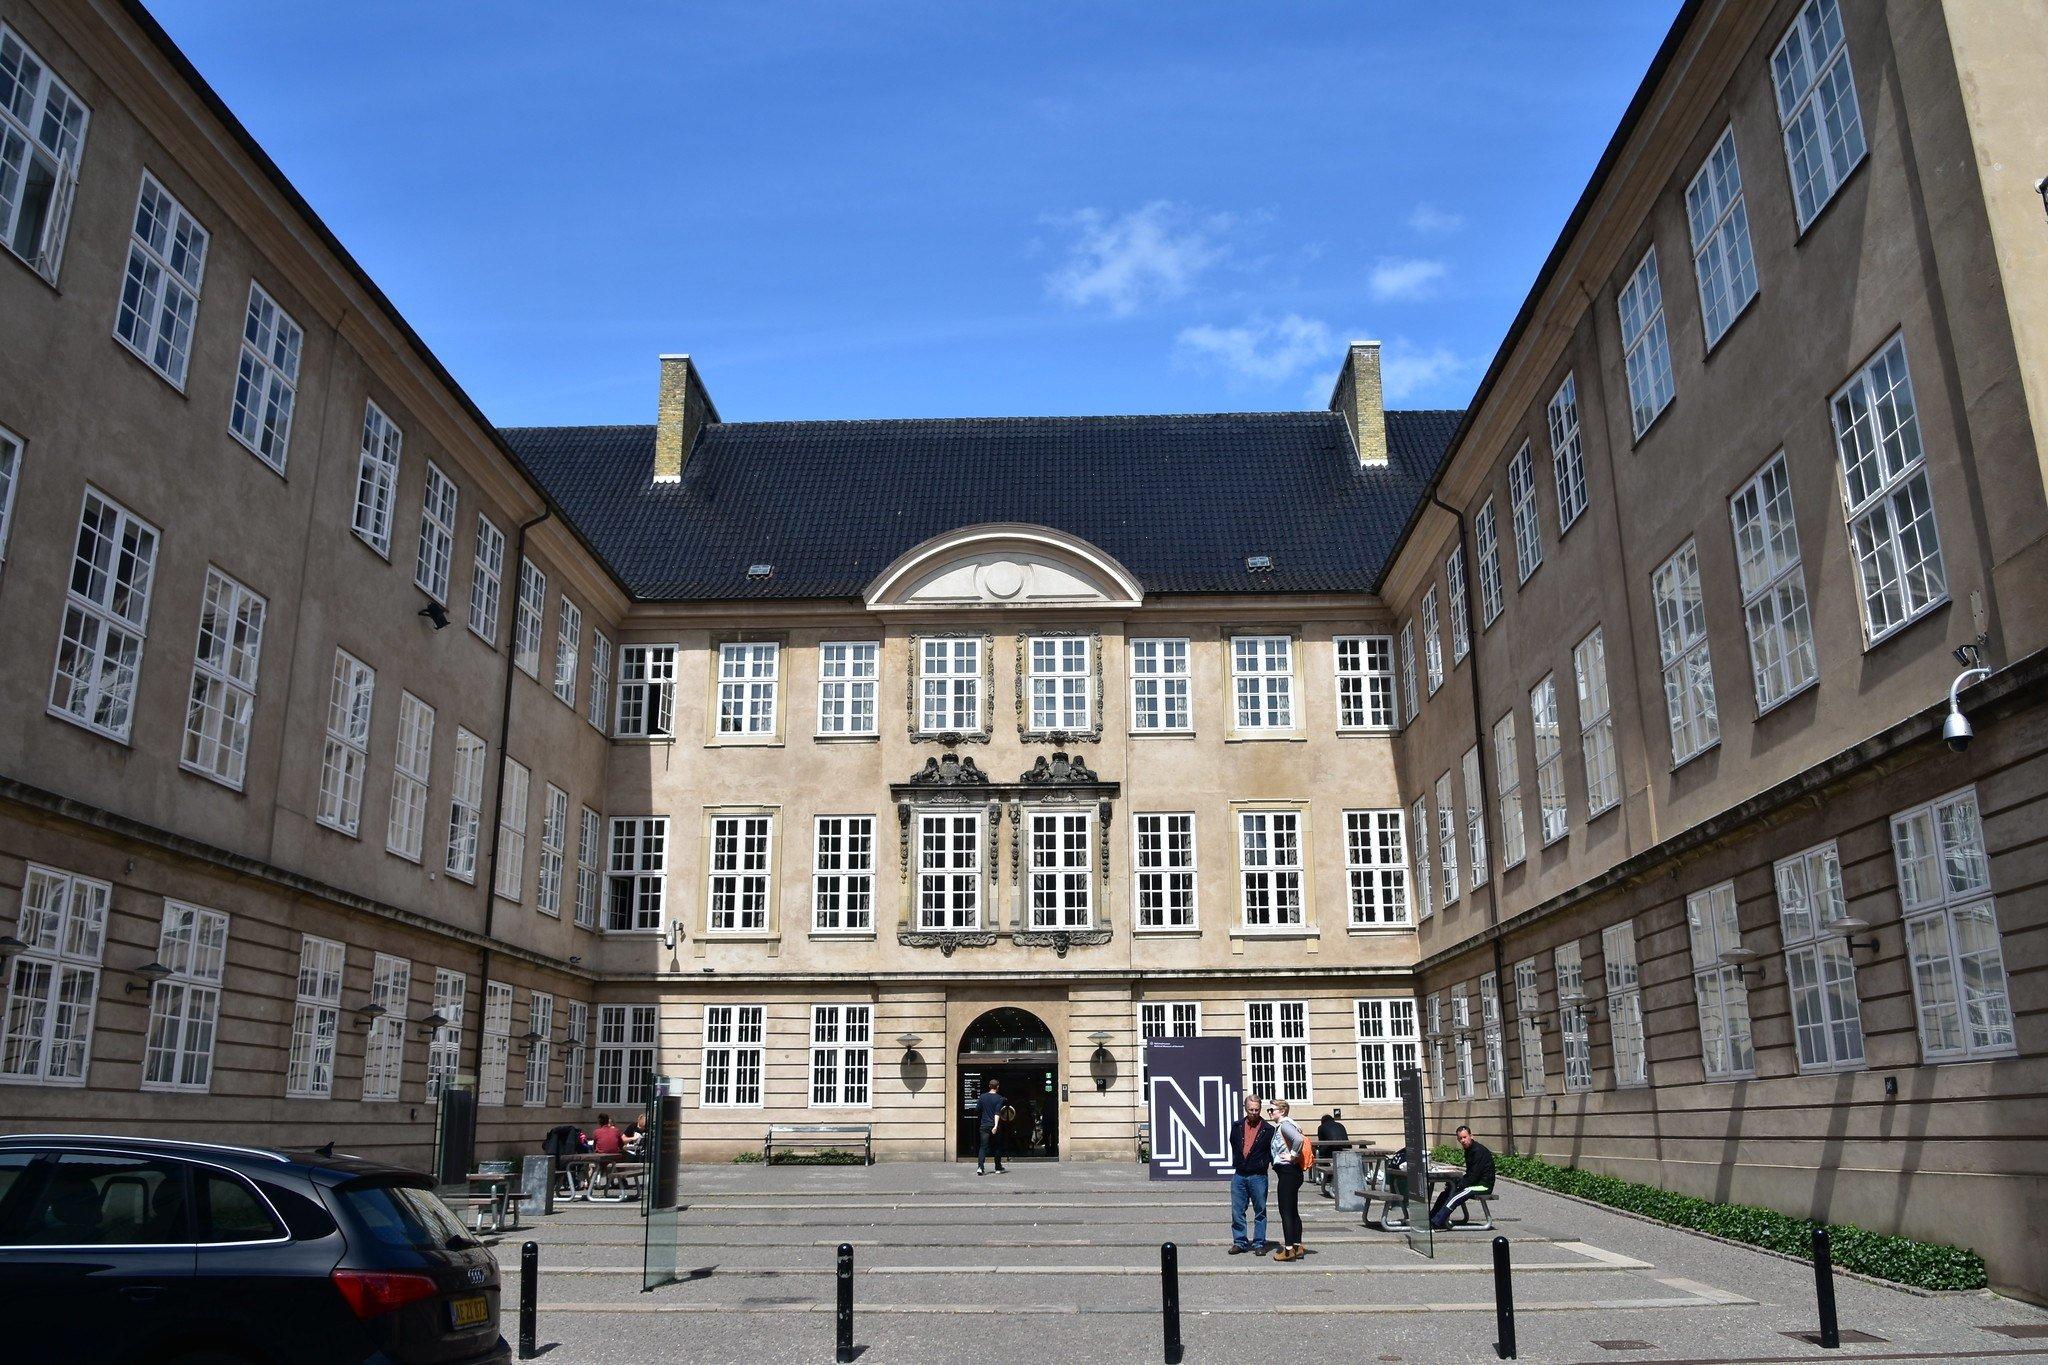 The National Museum of Denmark